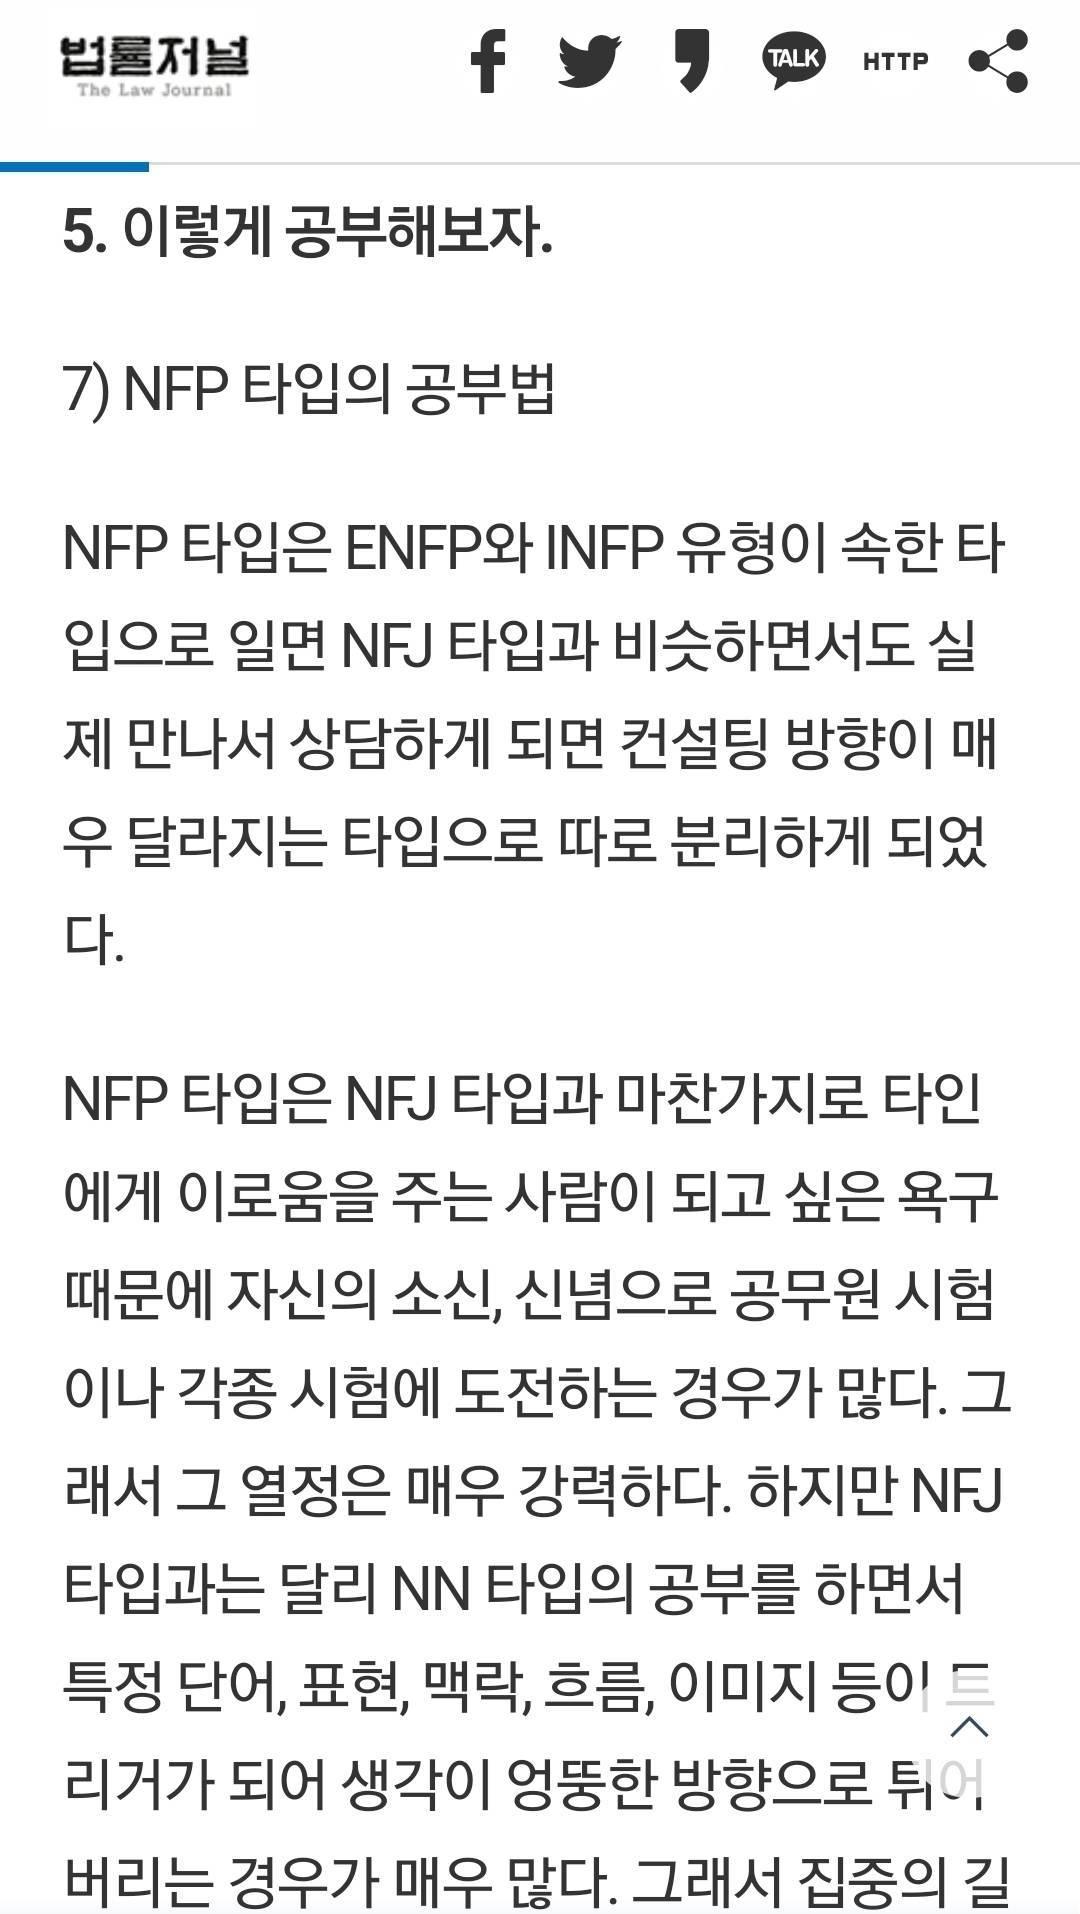 ENFP , INFP 공부습관과 공부법 | 인스티즈